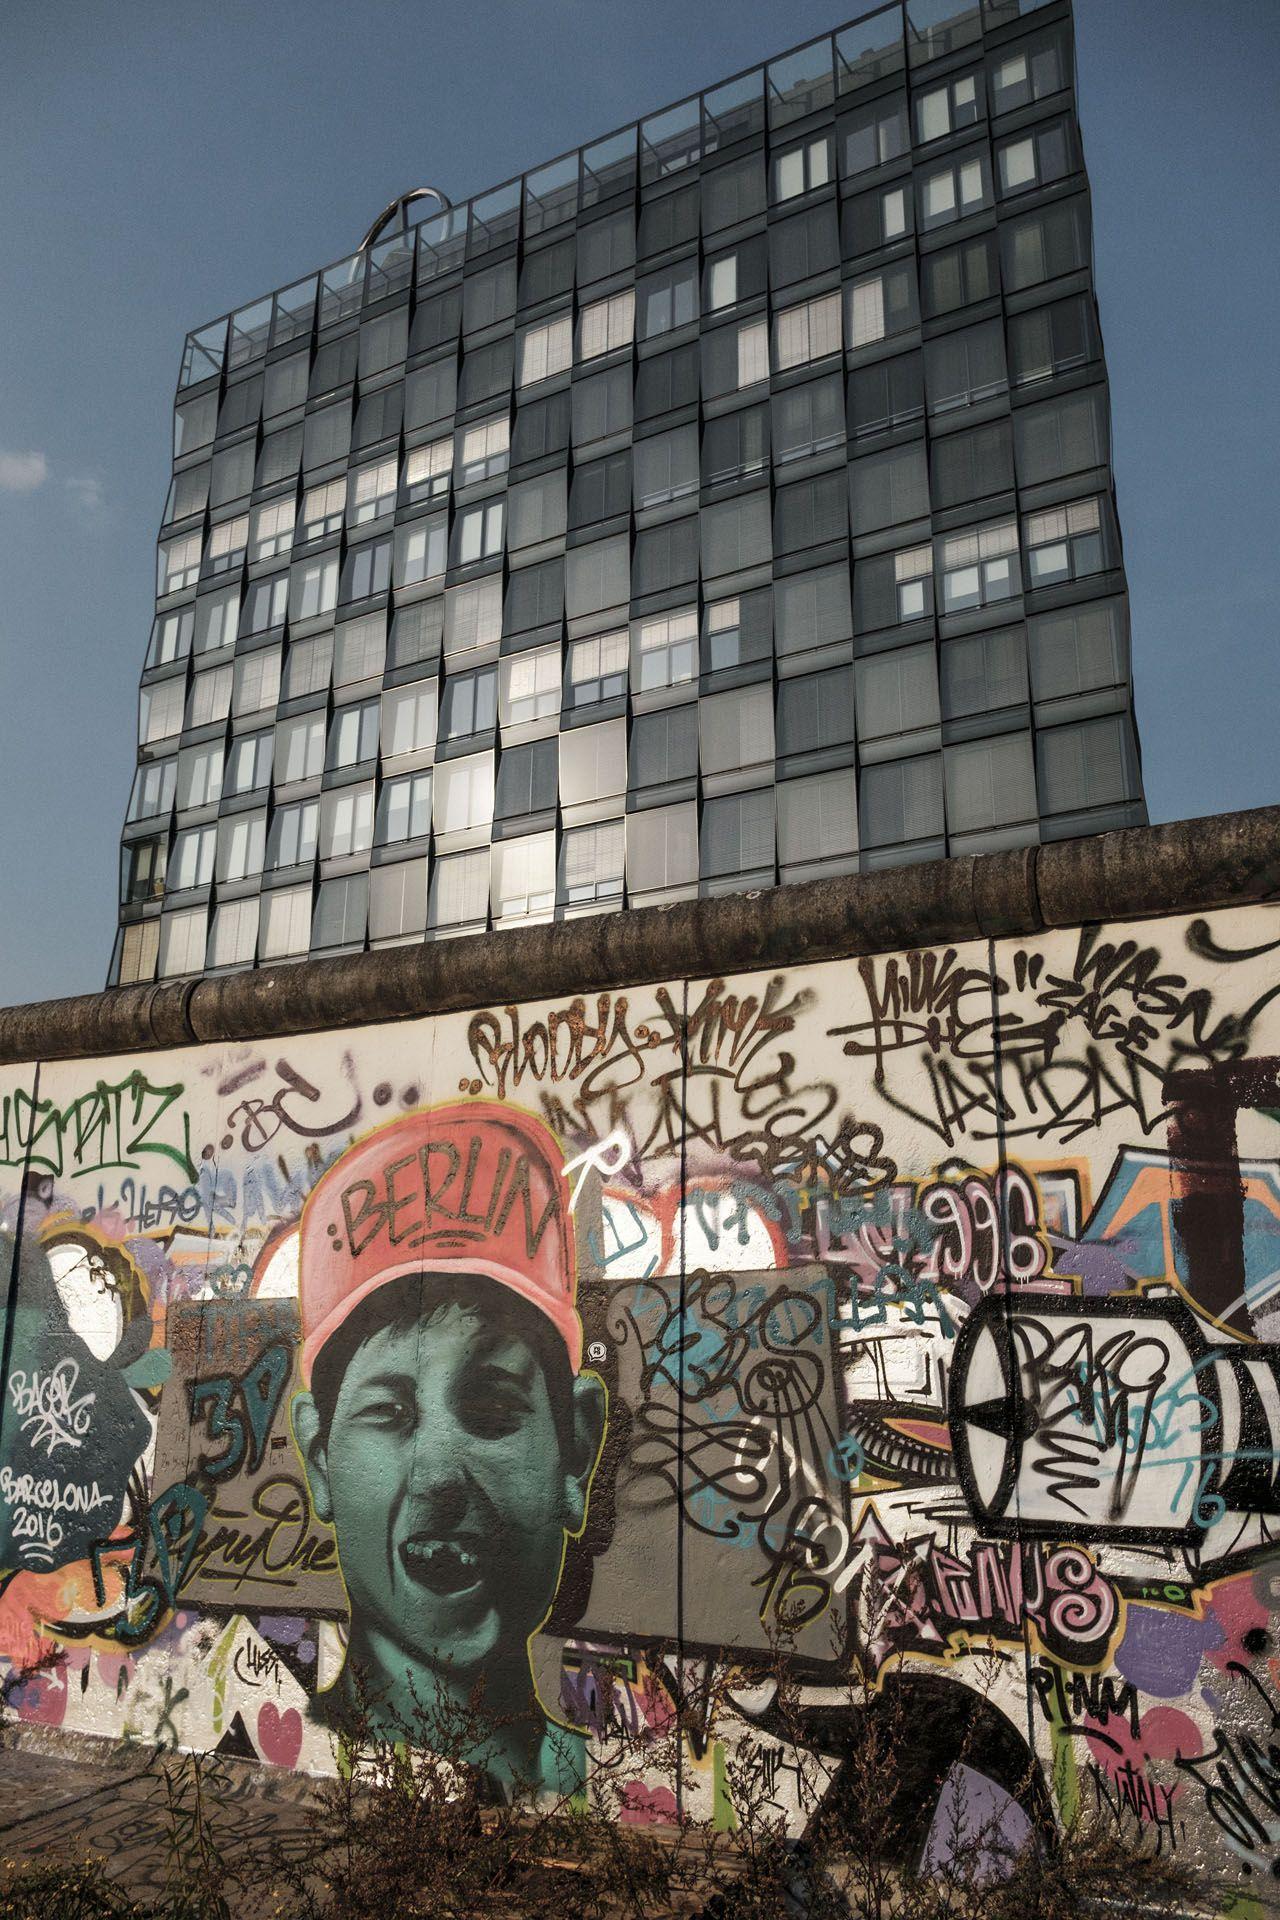 Berlin Graffiti East Side Gallery Graffiti Street Art Berliner Mauer